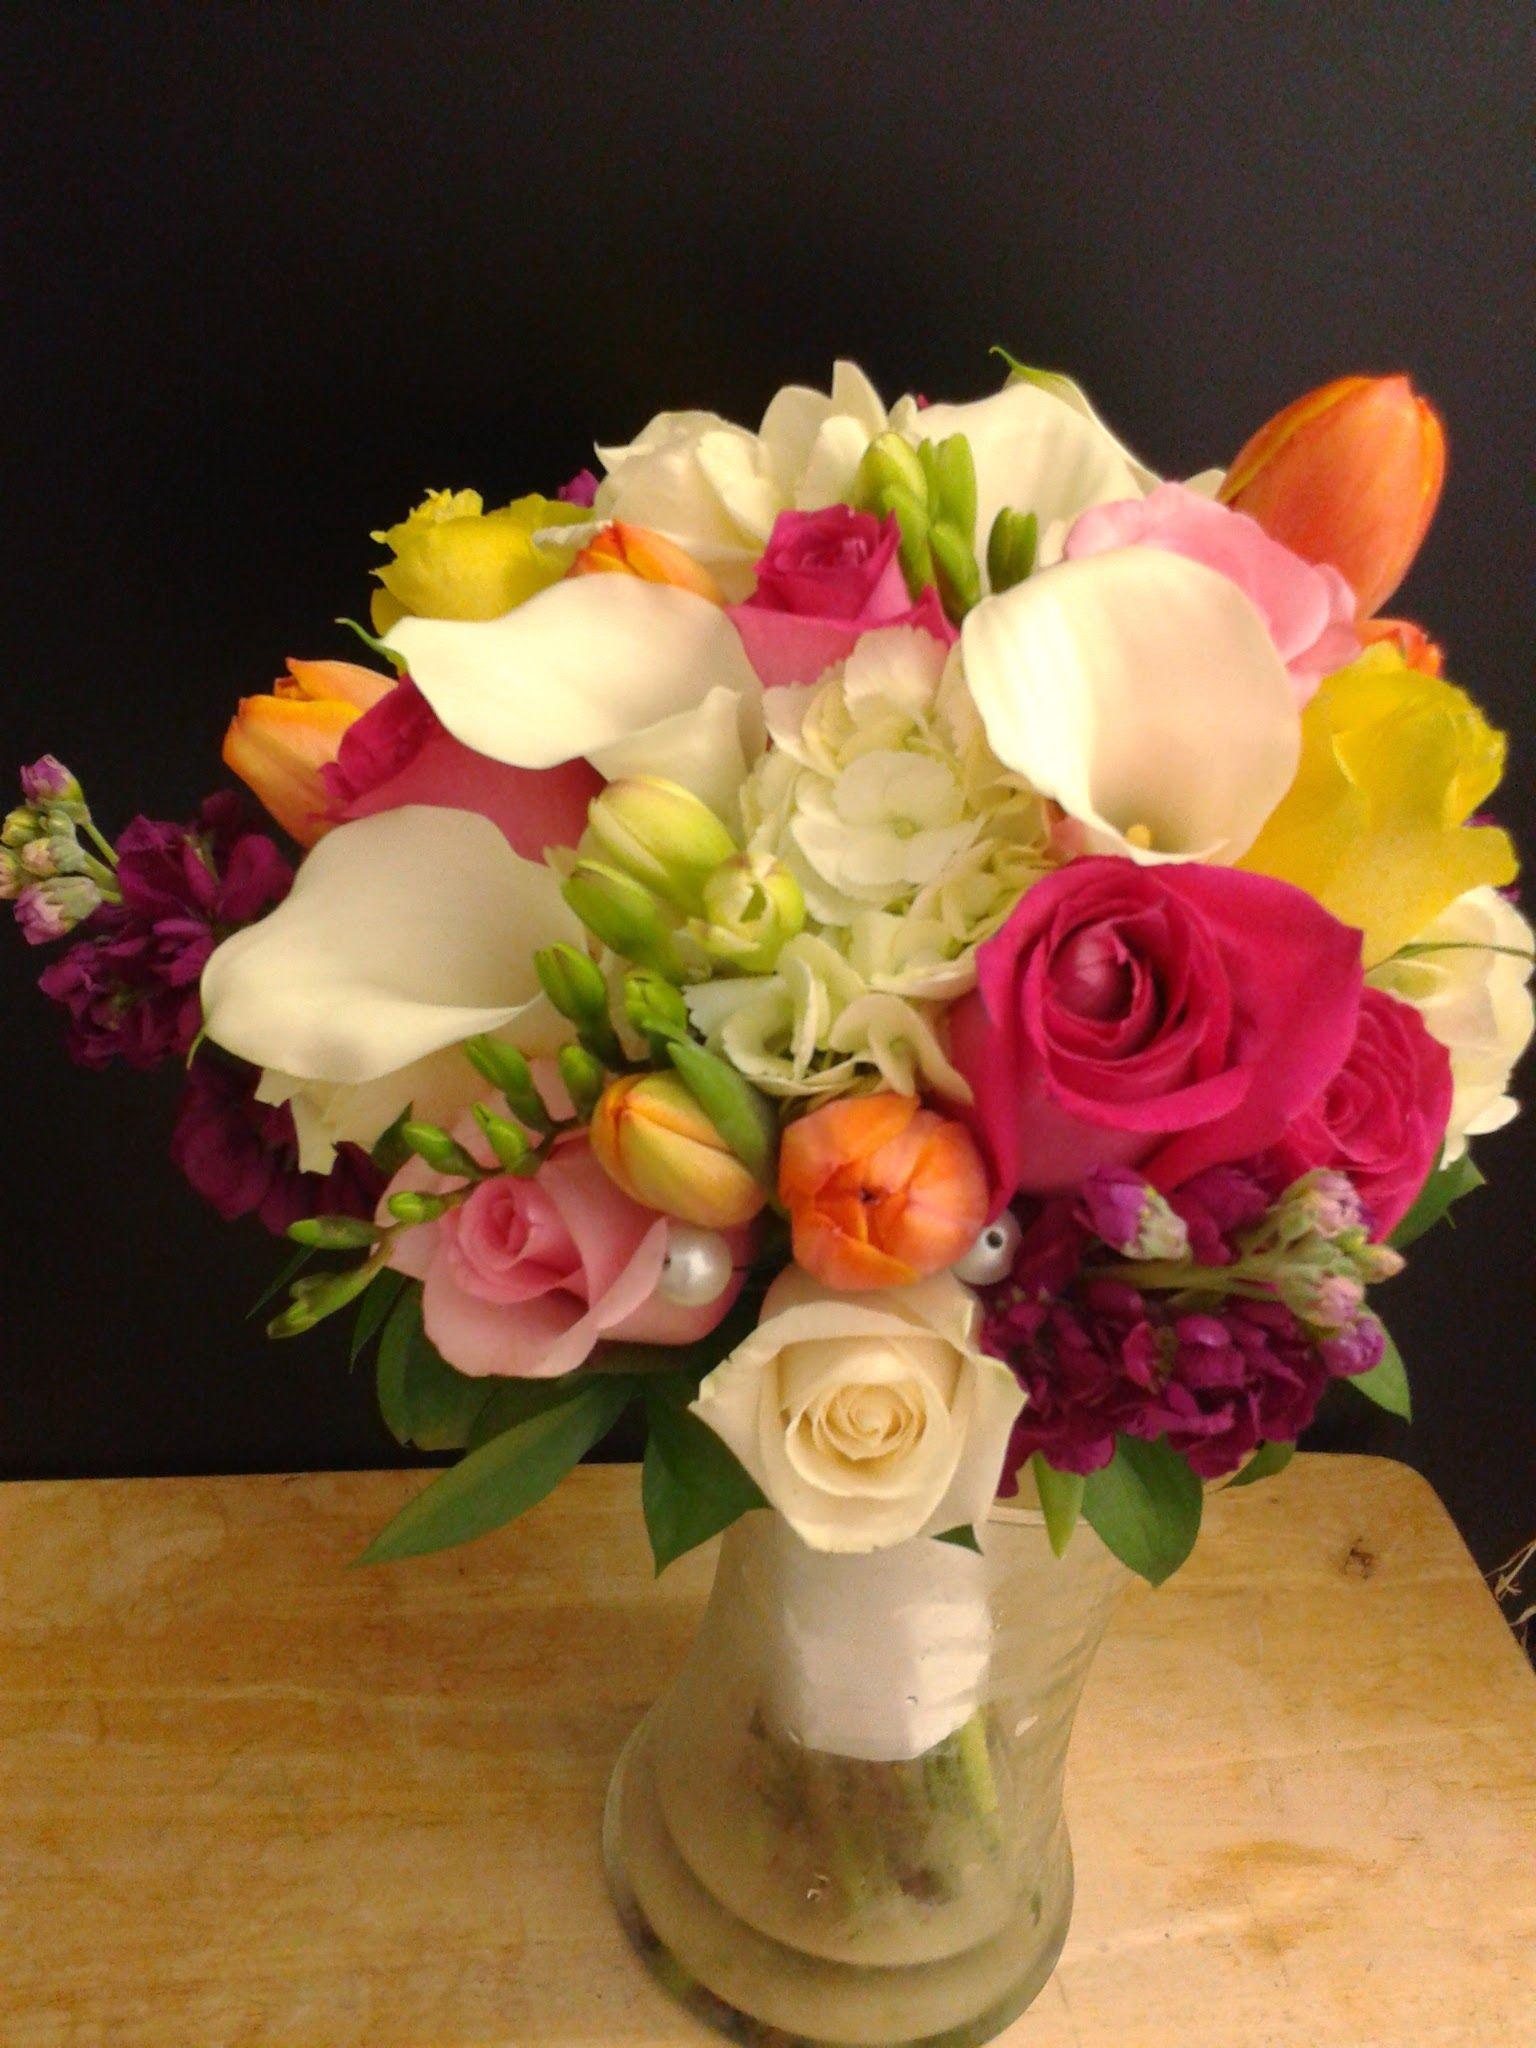 Flower mikan wedding bouquet sweet pink calla pinterest lovely unique florist in san diego flower studio mikan wedding bouquets floristssan izmirmasajfo